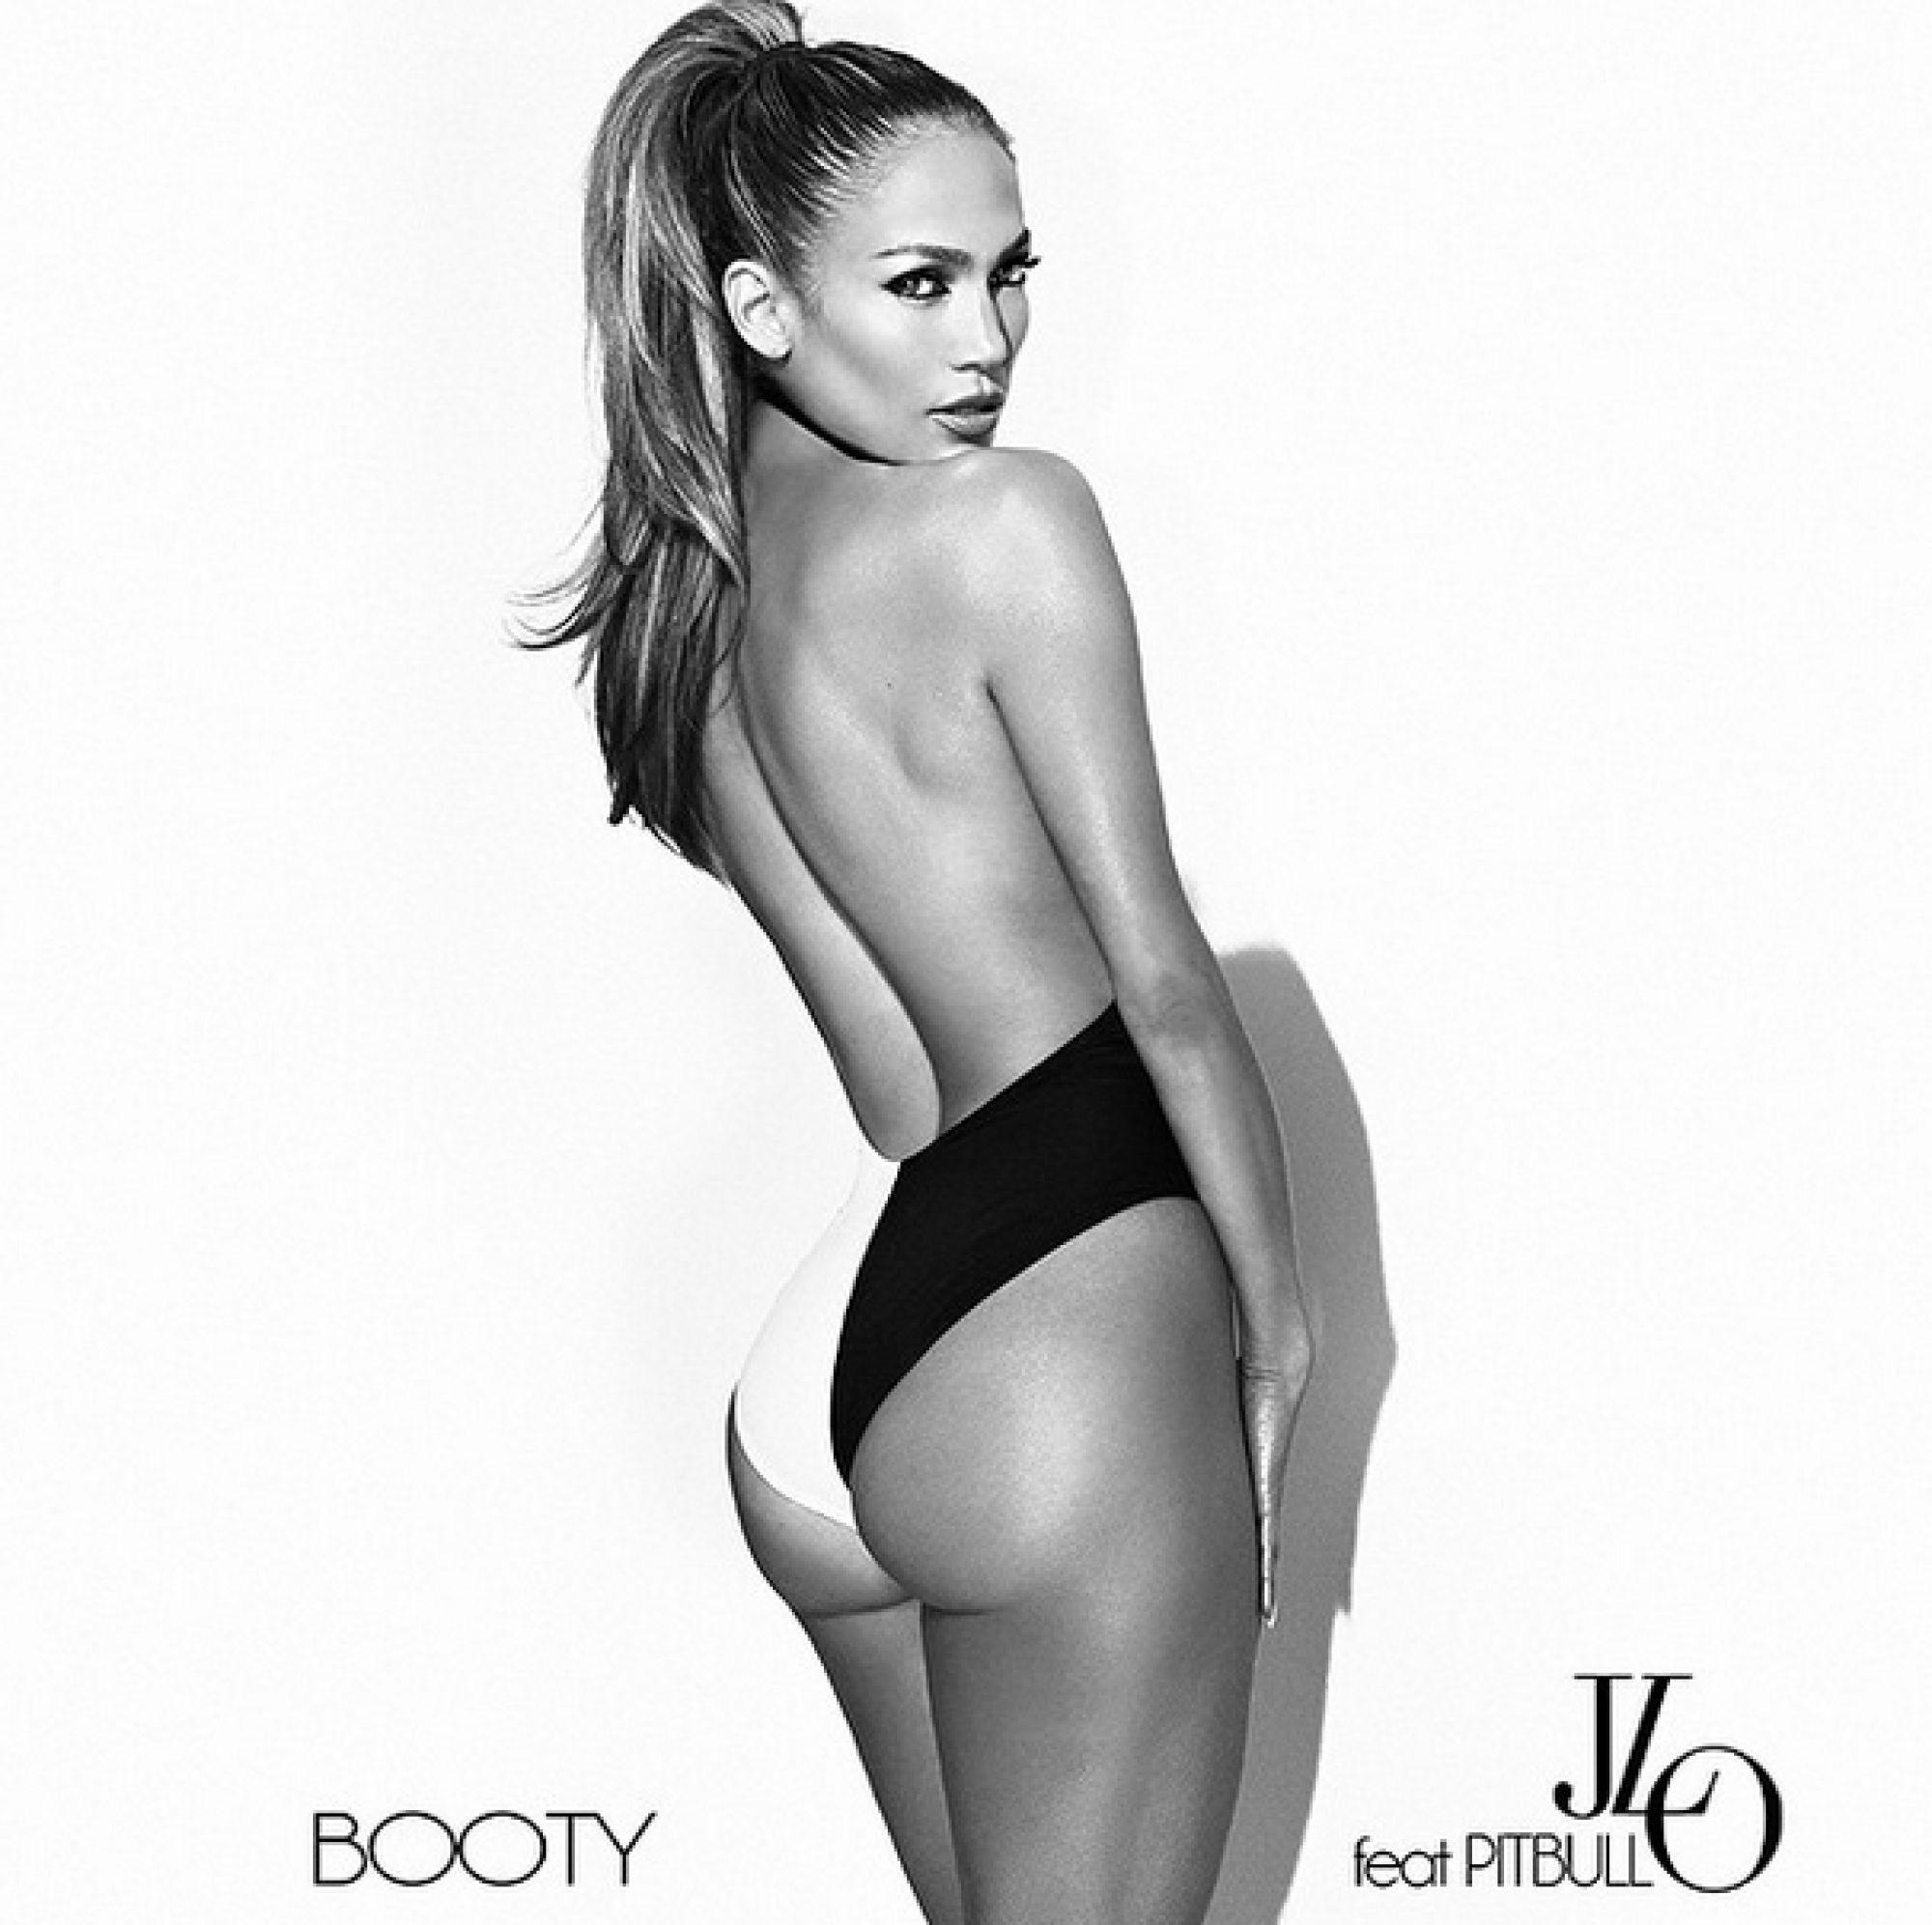 Jennifer Lopez featuring Pit Bull – Booty [Adrien DJX King Remix]